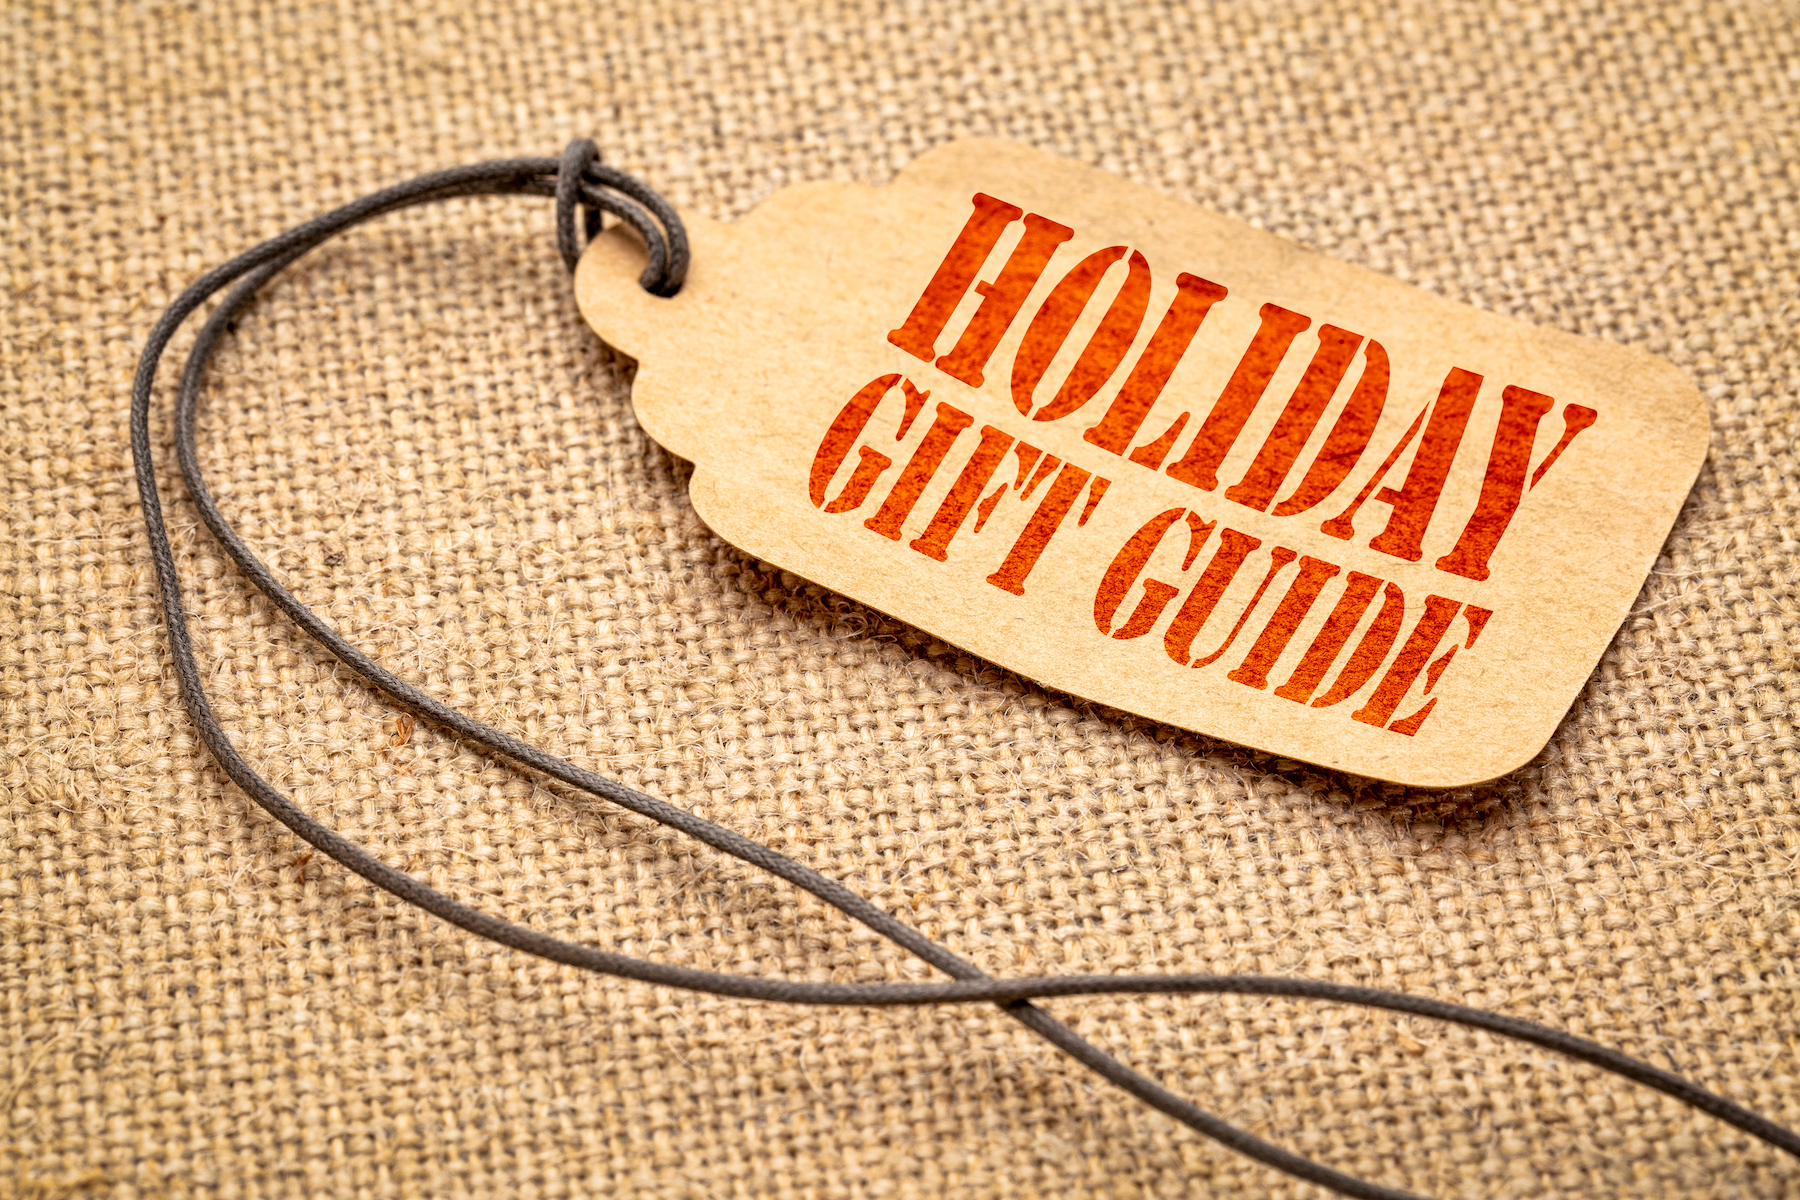 Top 8 Holiday Marketing Tips